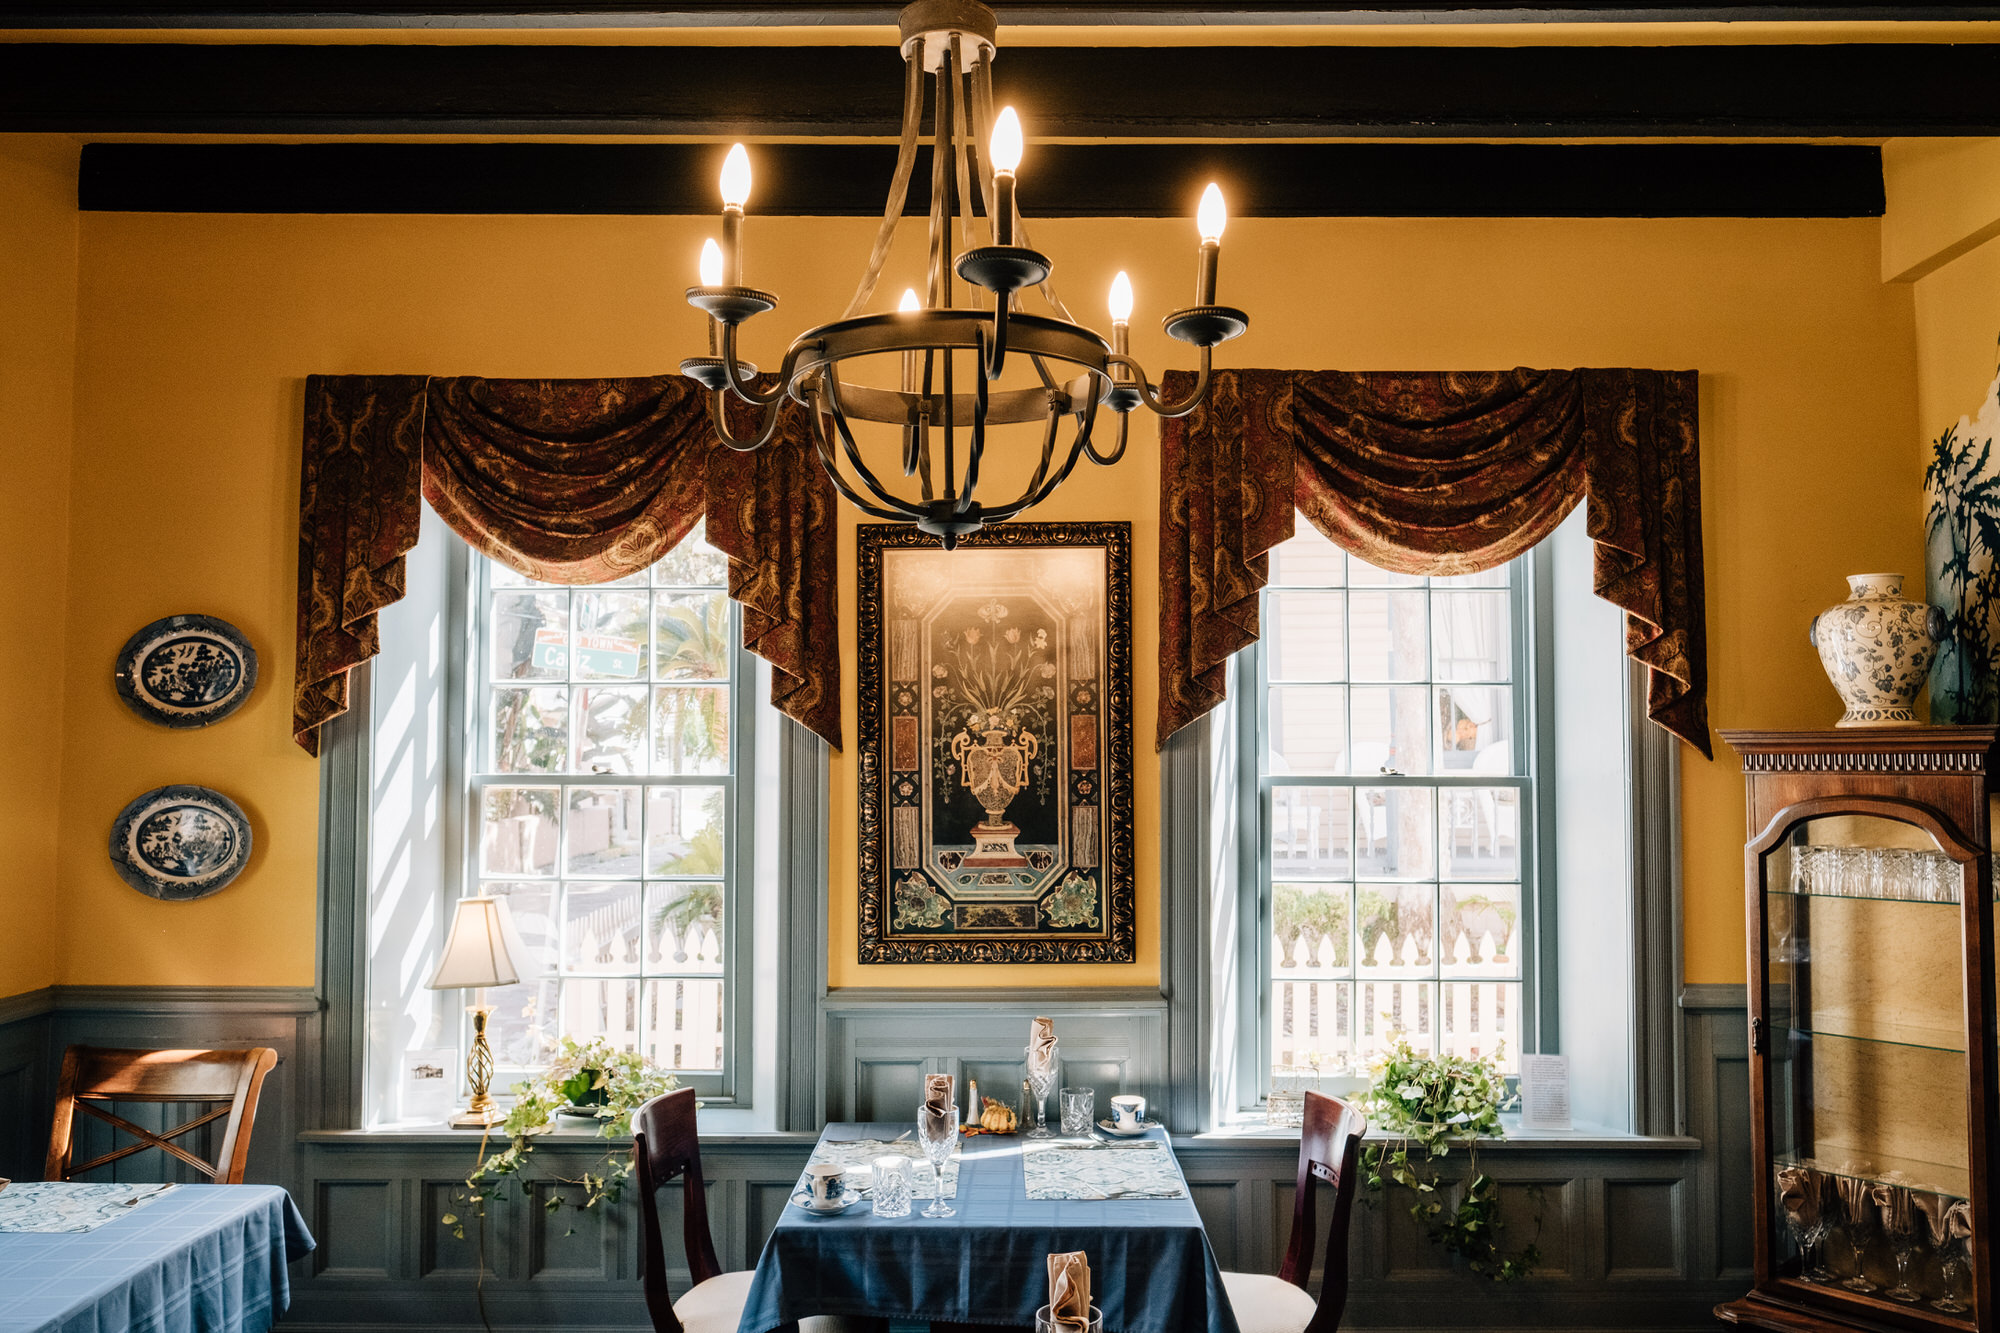 Casa De Solana St. Augustine - Amethyst Weddings